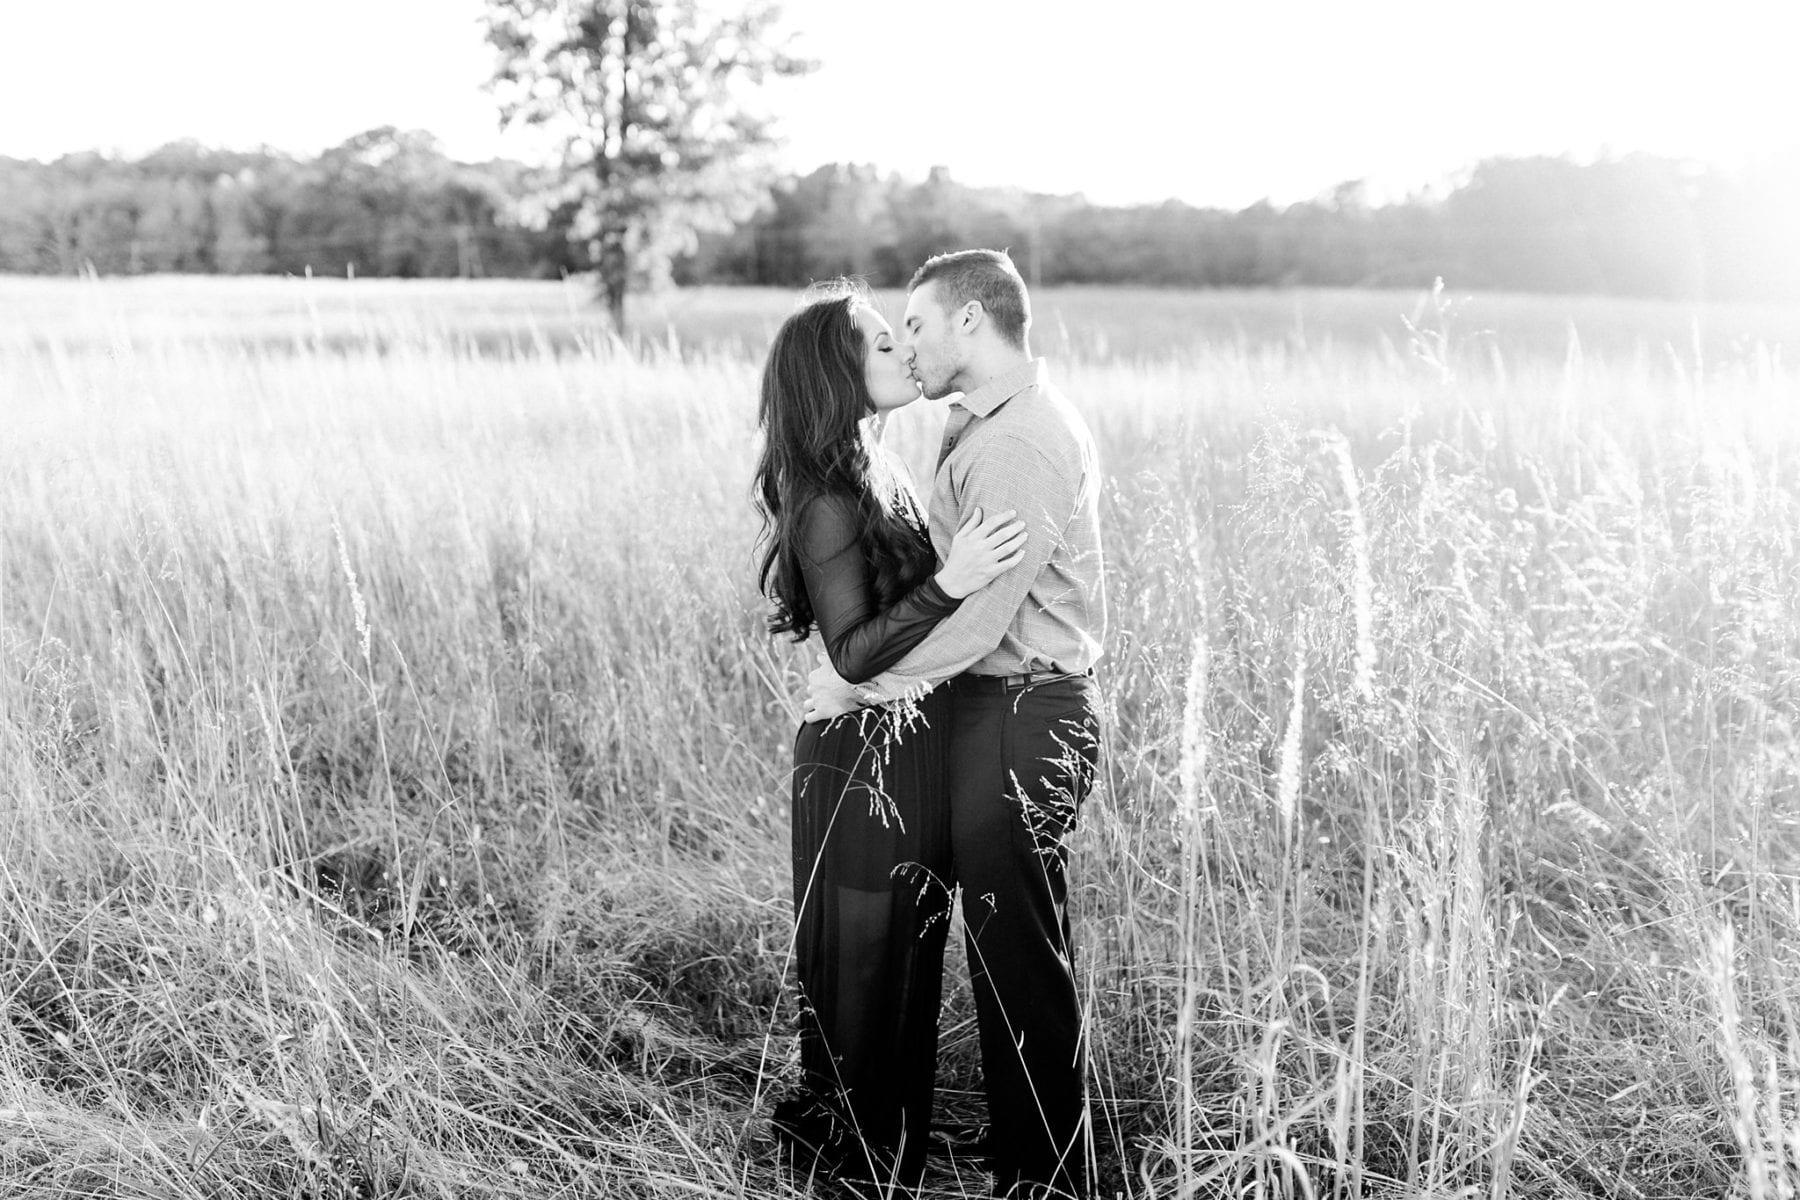 Manassas Battlefield Portraits Virginia Wedding Photographer Megan Kelsey Photography Lianne & Chris-245.jpg